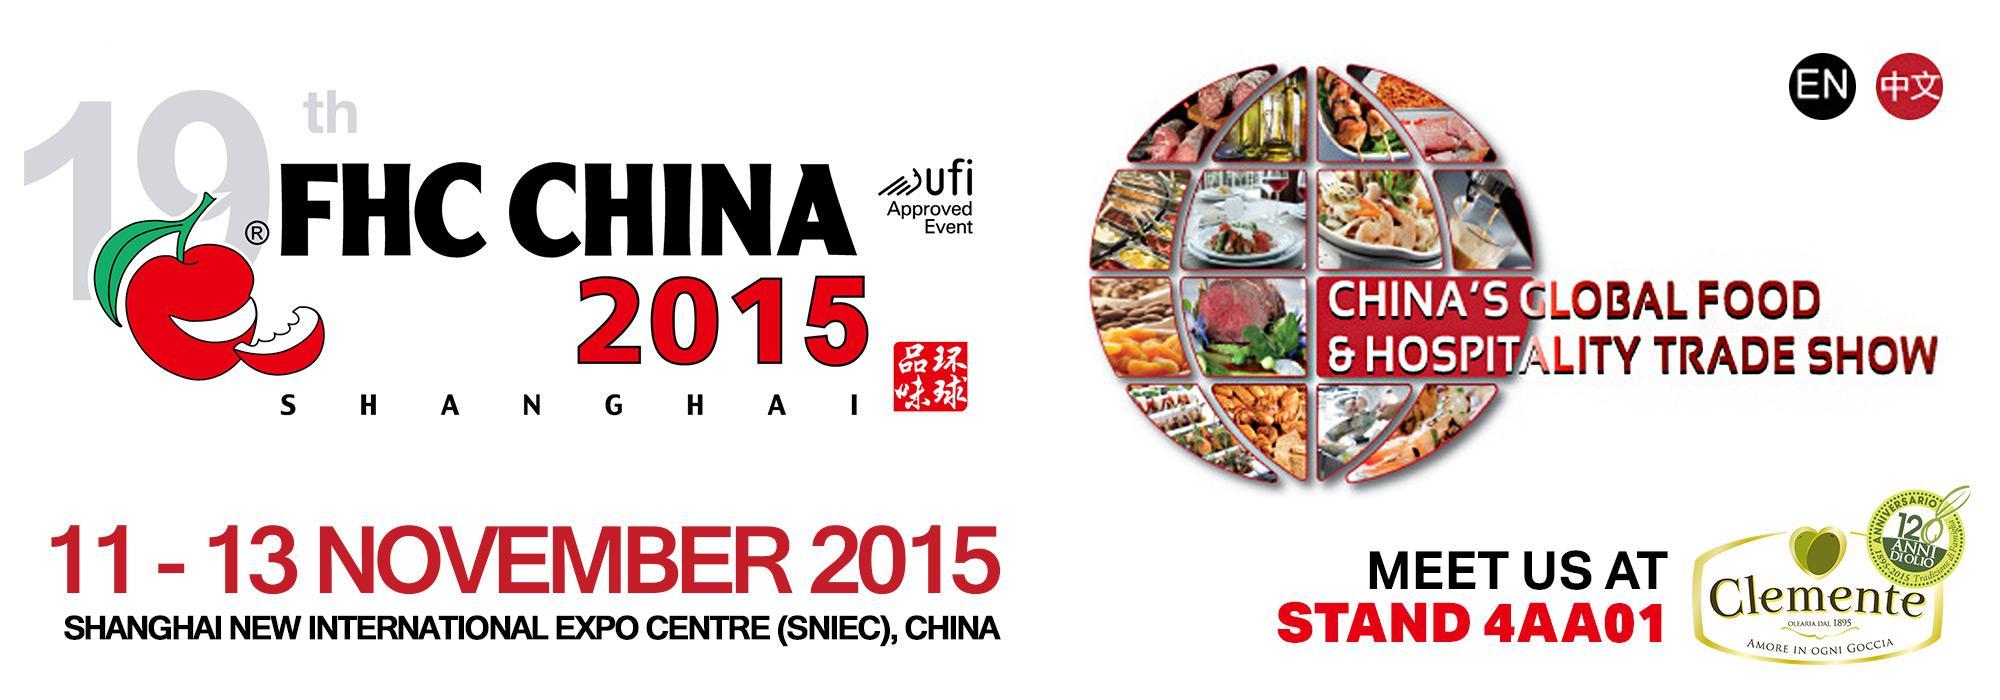 slider-fhc-china-2015